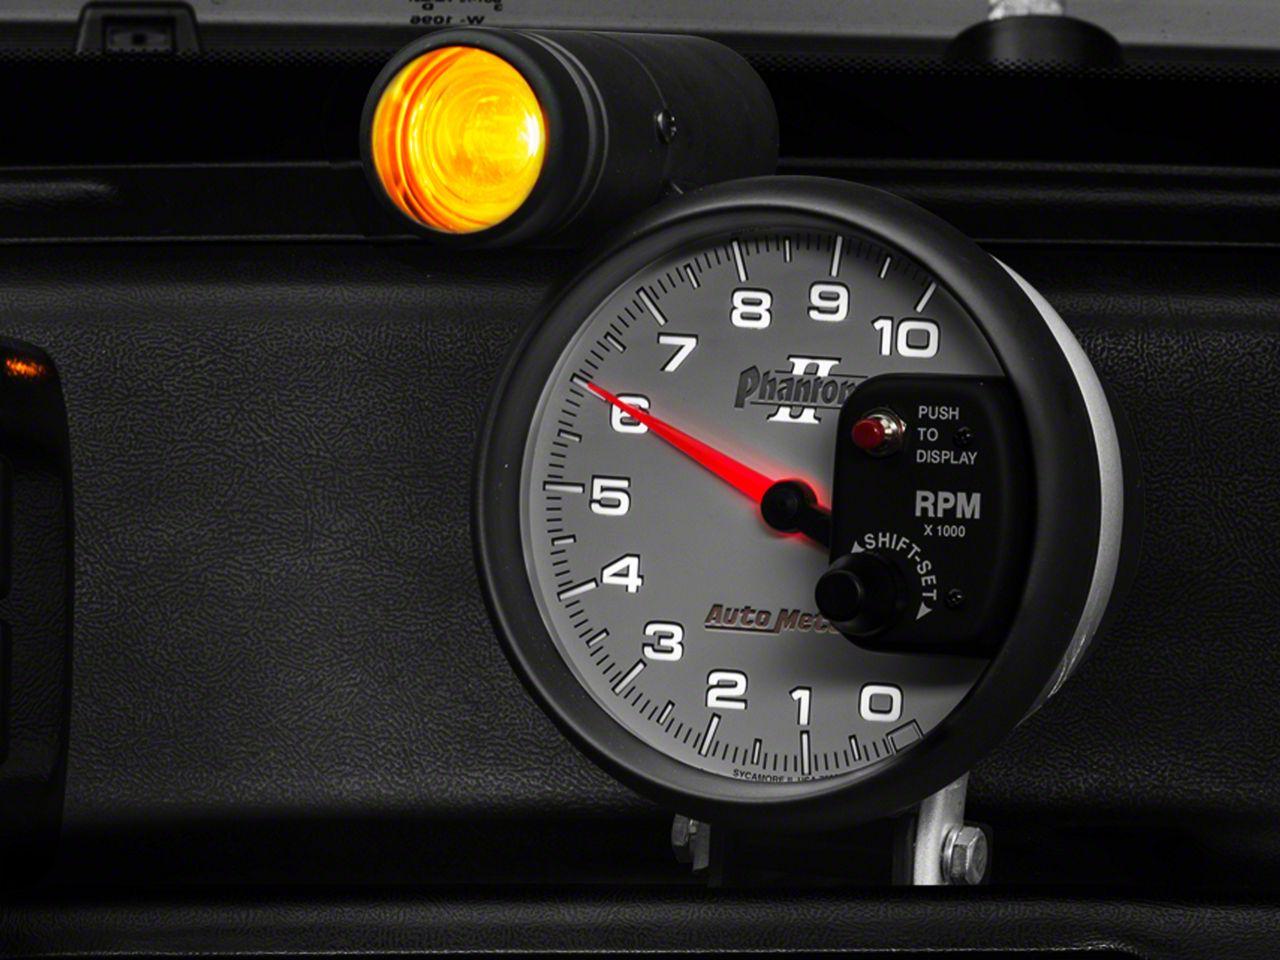 Auto Meter Phantom II 5 in. Tachometer w/ Shift Light (08-18 All)